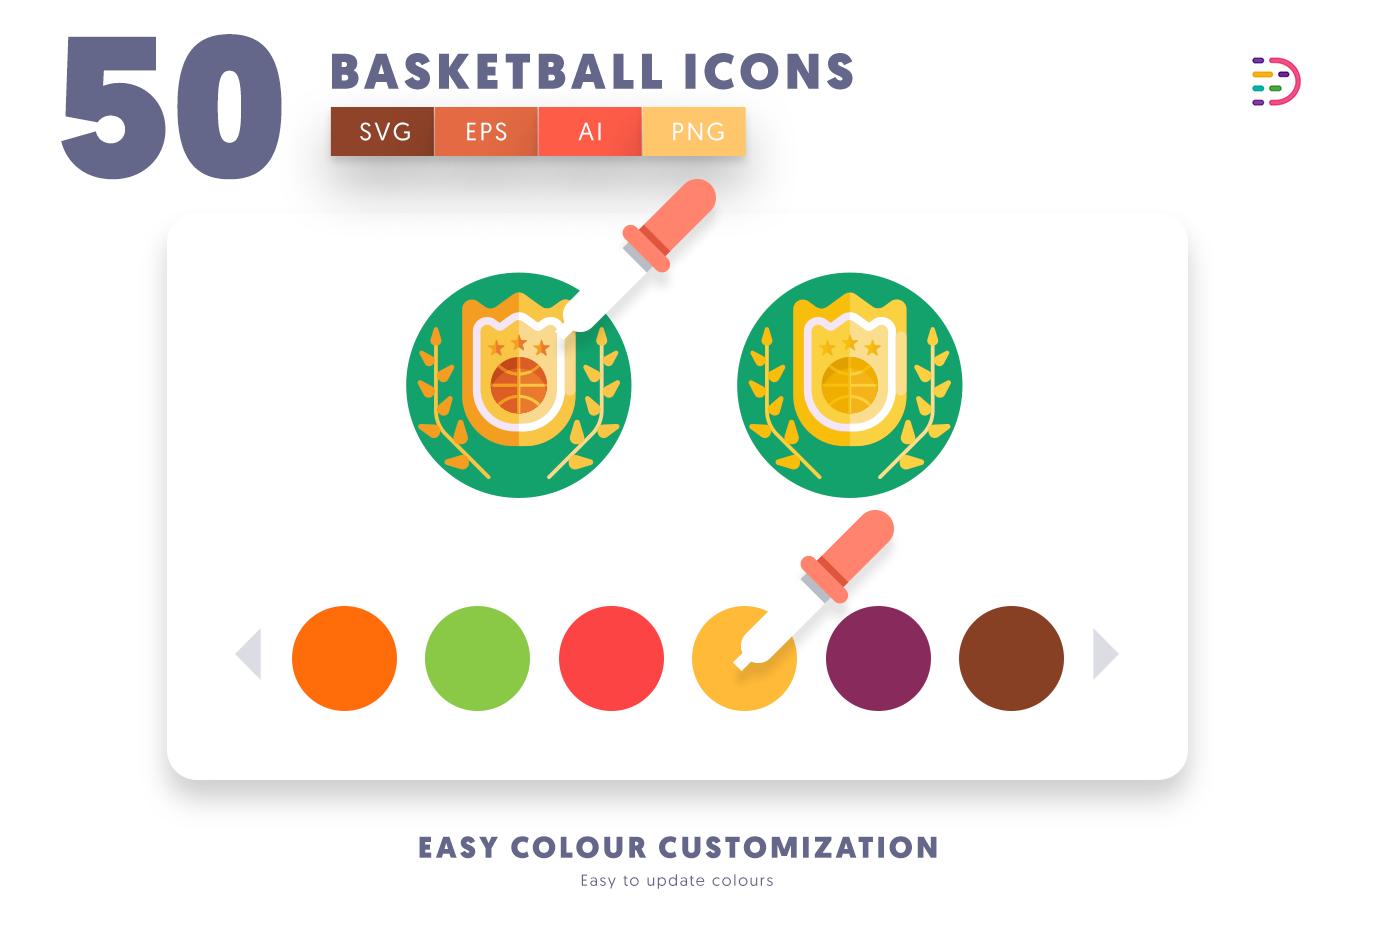 Customizable and vector 50 Basketball Icons